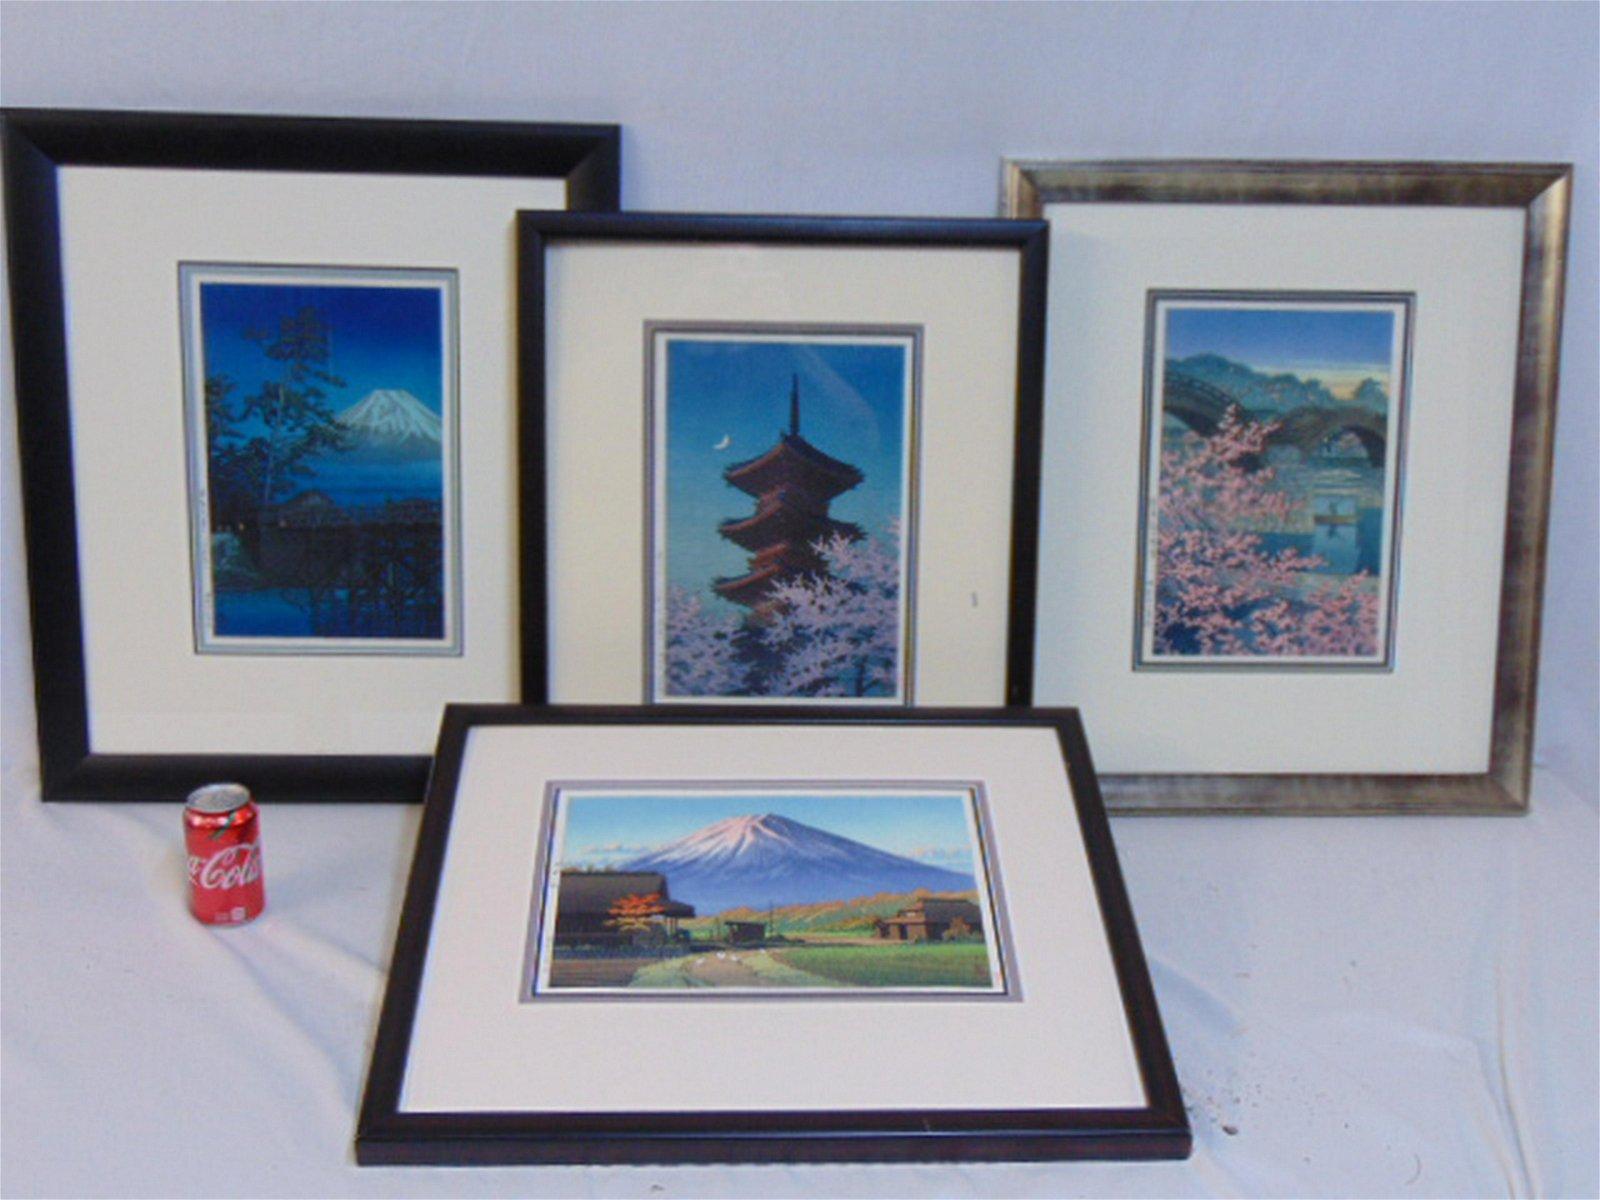 4 Japanese woodblocks, Kawase Hasui, 4 original